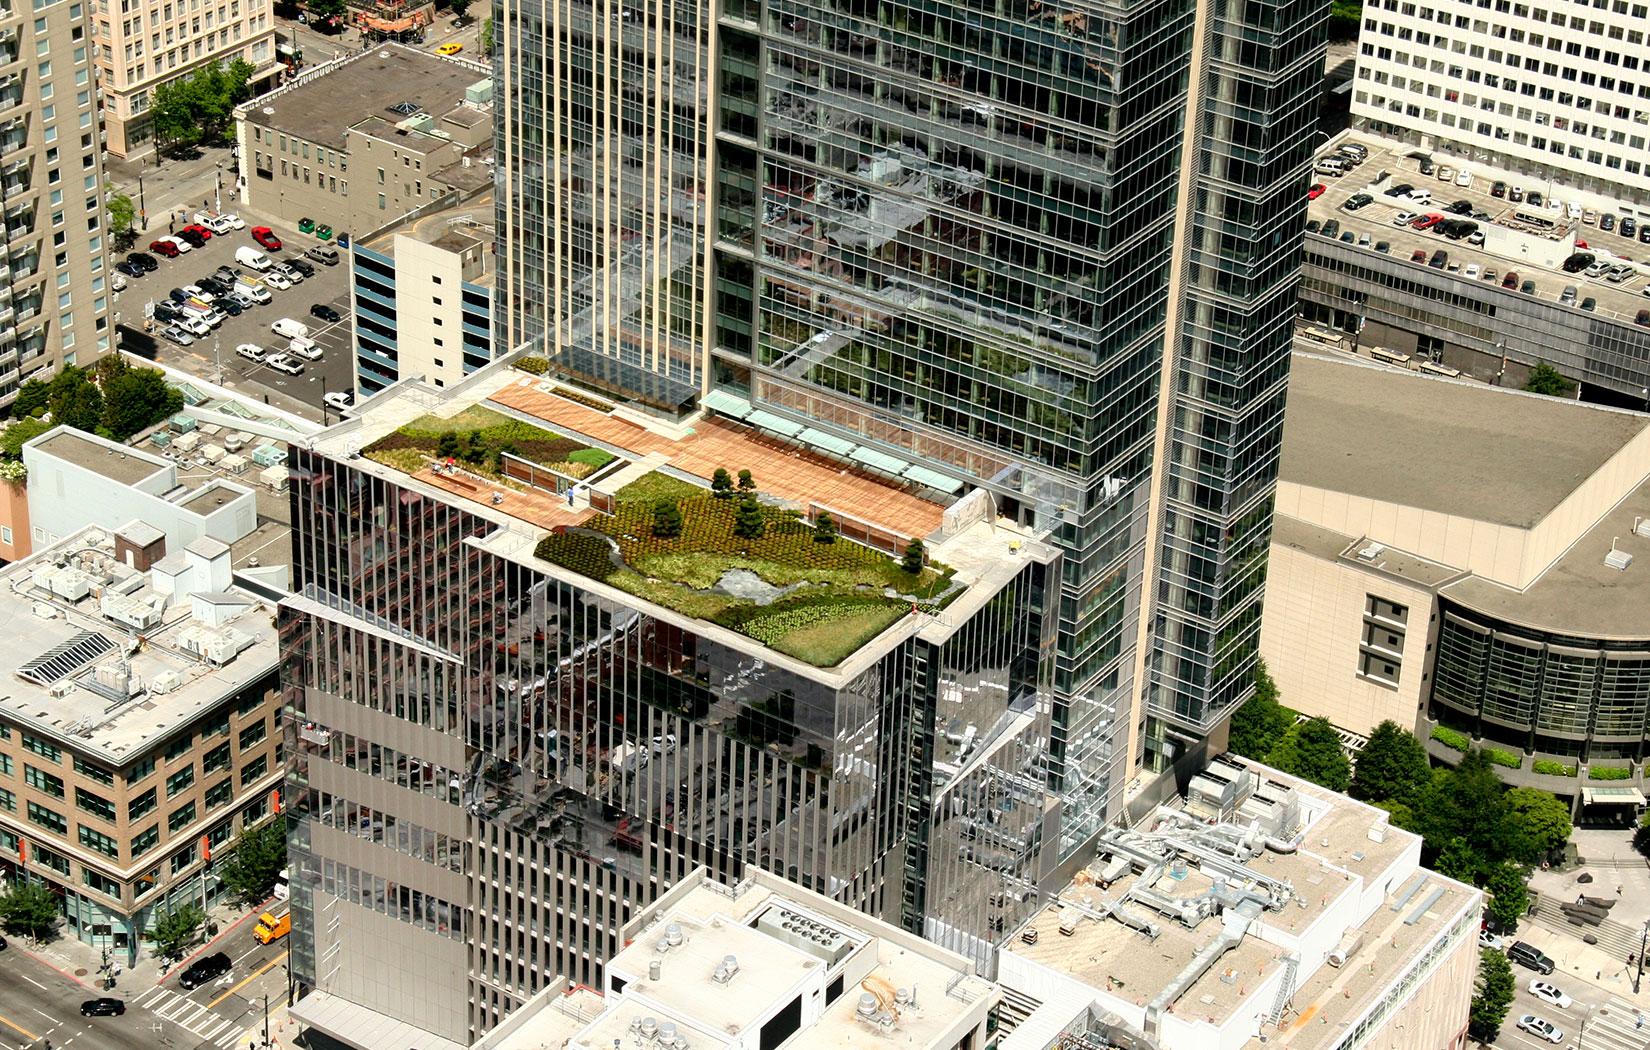 Wamu Seattle Art Museum Roof Garden Pfs Studio